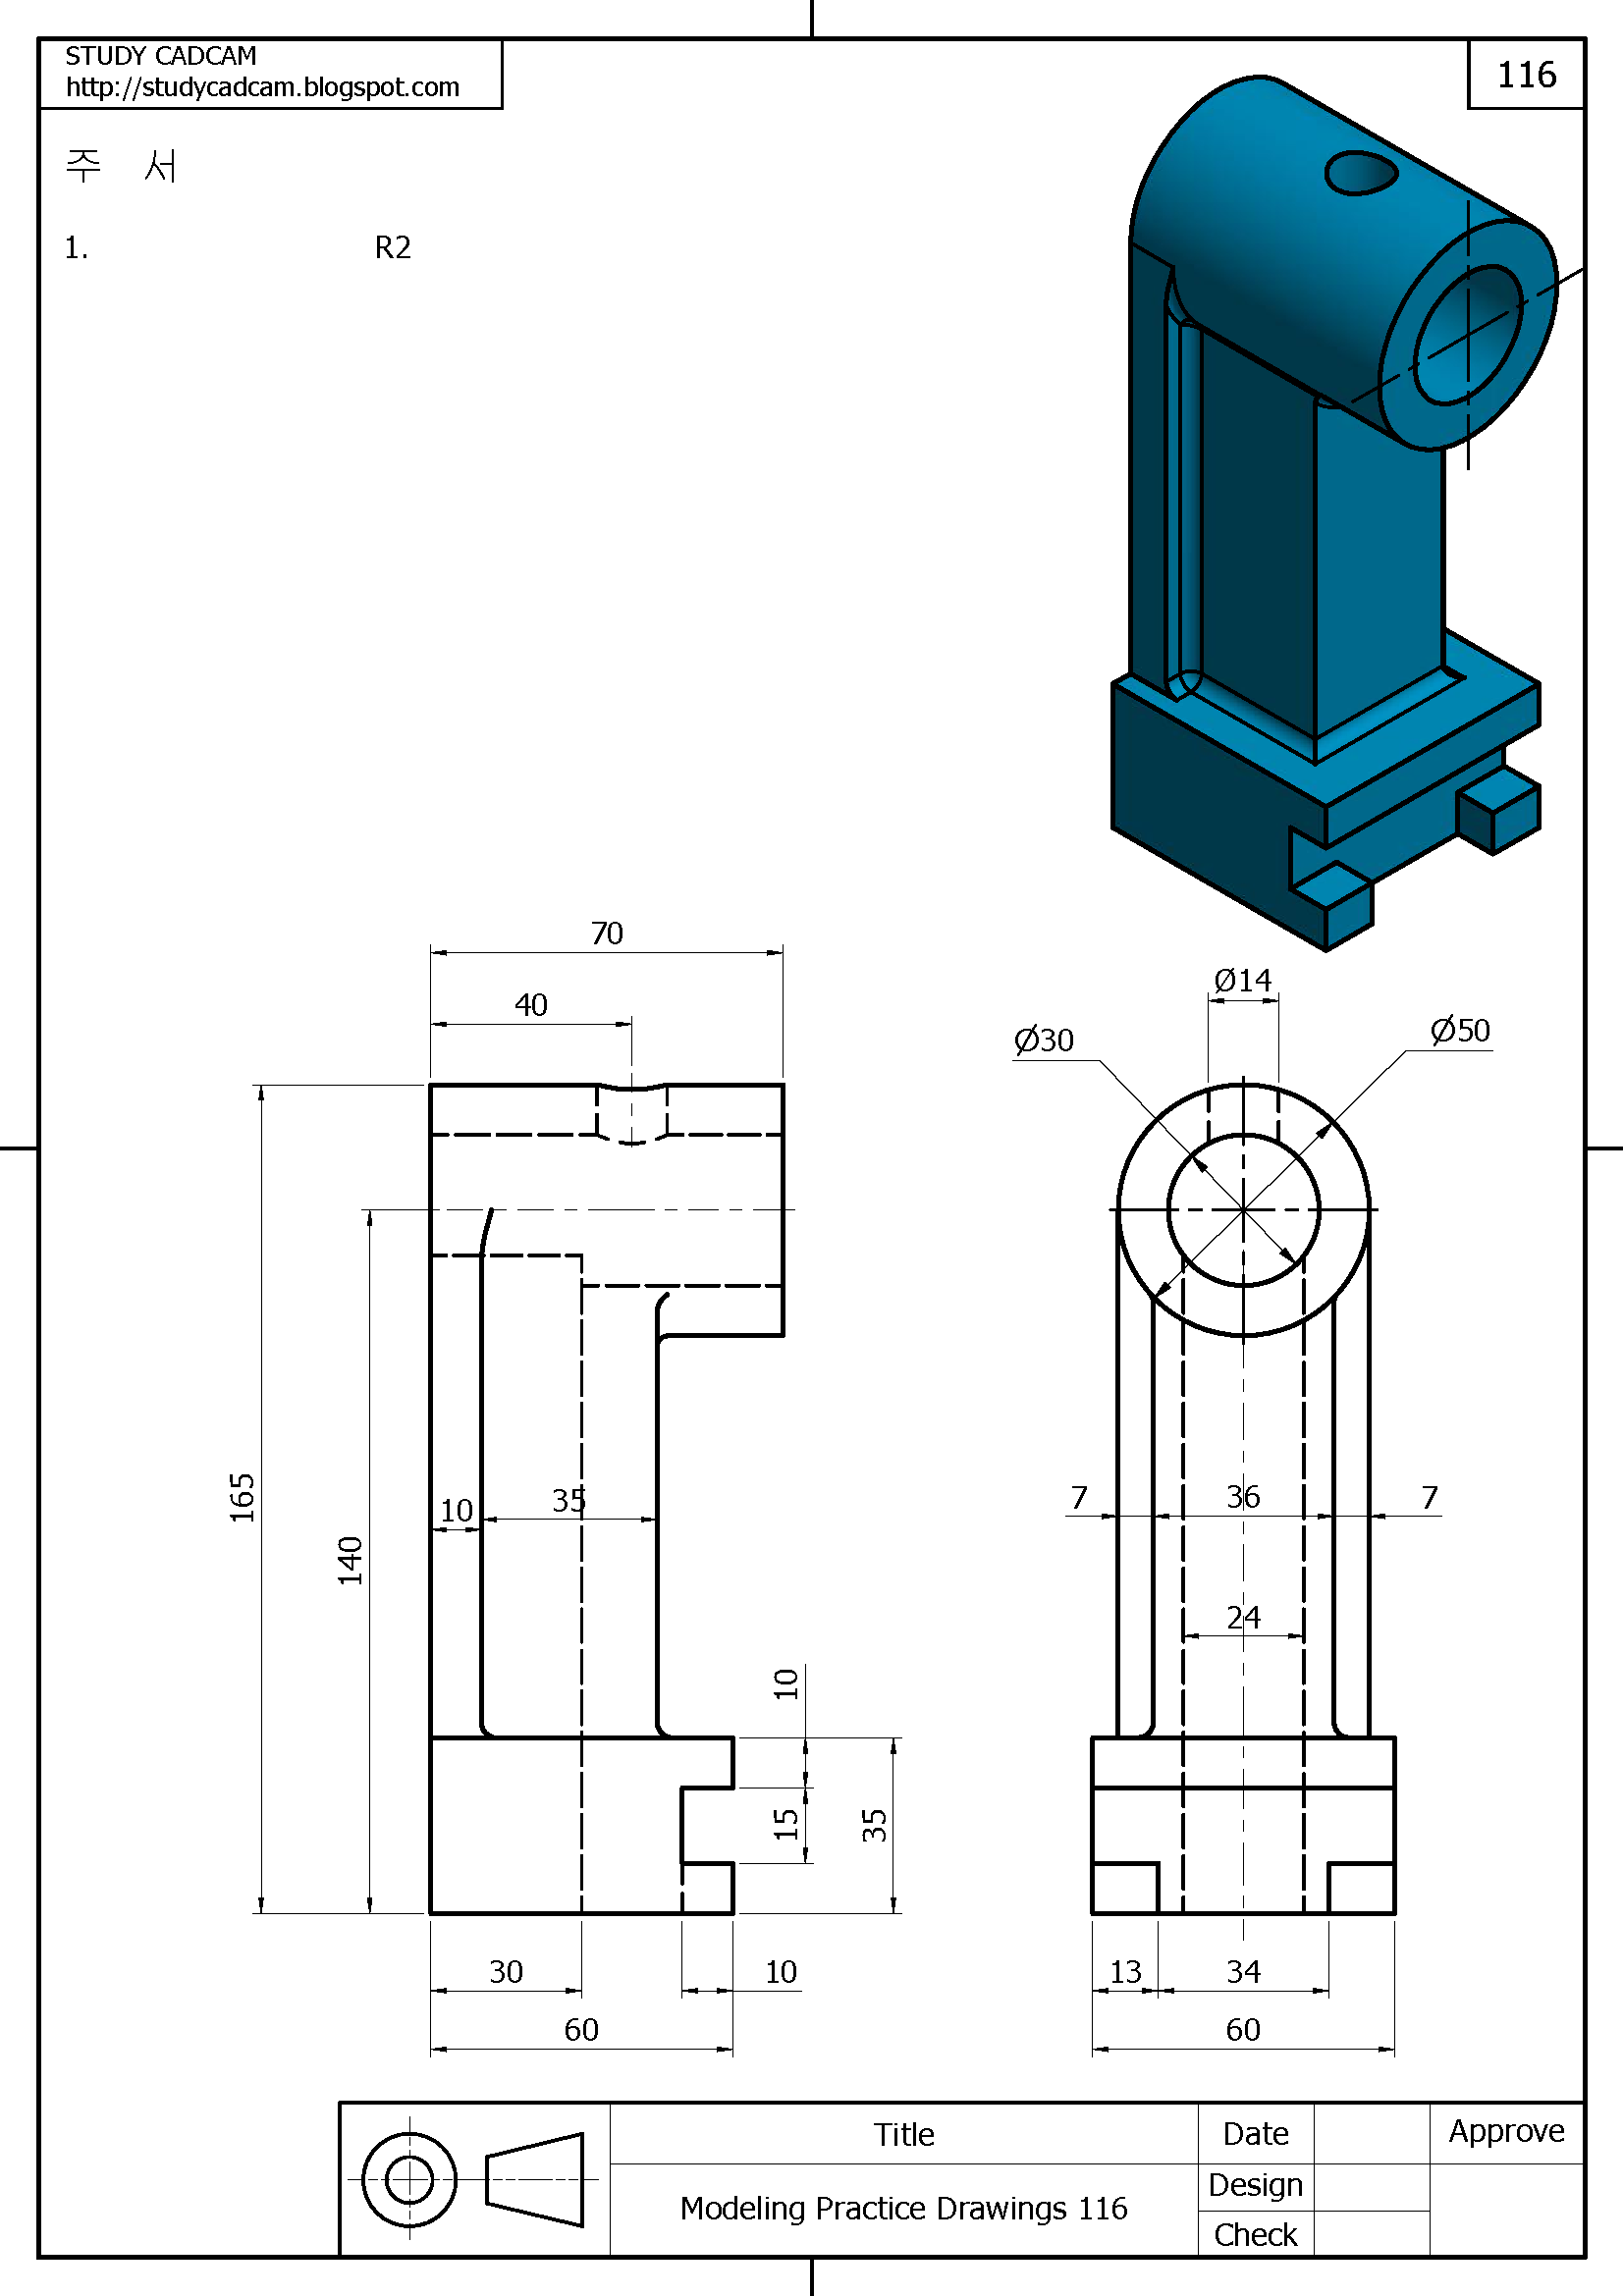 Pin de STUDY CADCAN en 3D Modeling Practice  Pinterest  Dibujos